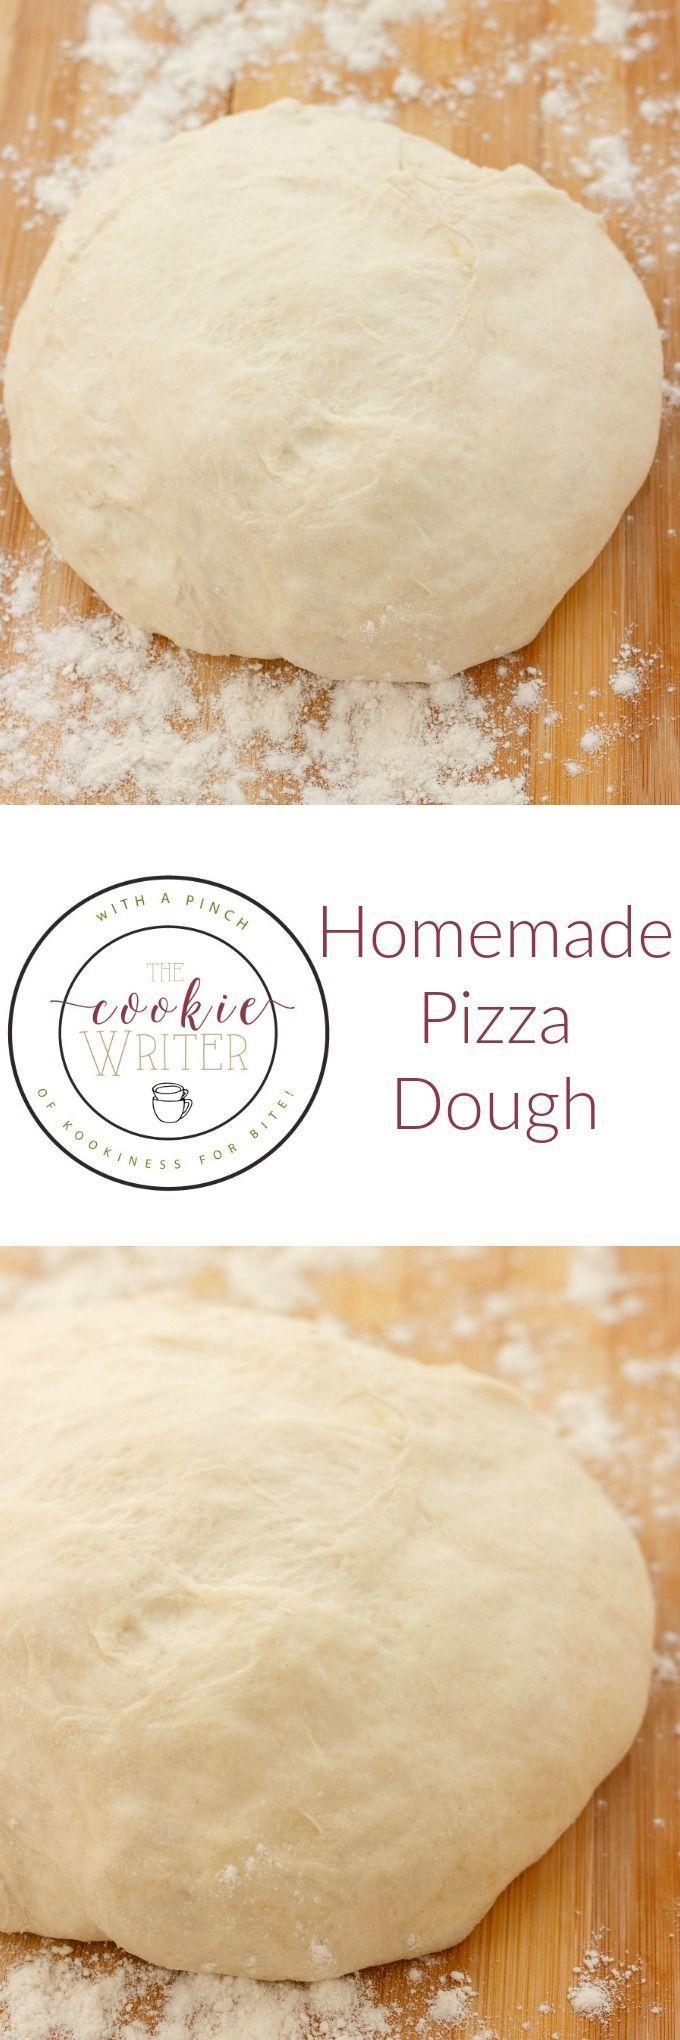 Homemade Pizza Dough | Recipe | Pizzas, Homemade and Dough pizza